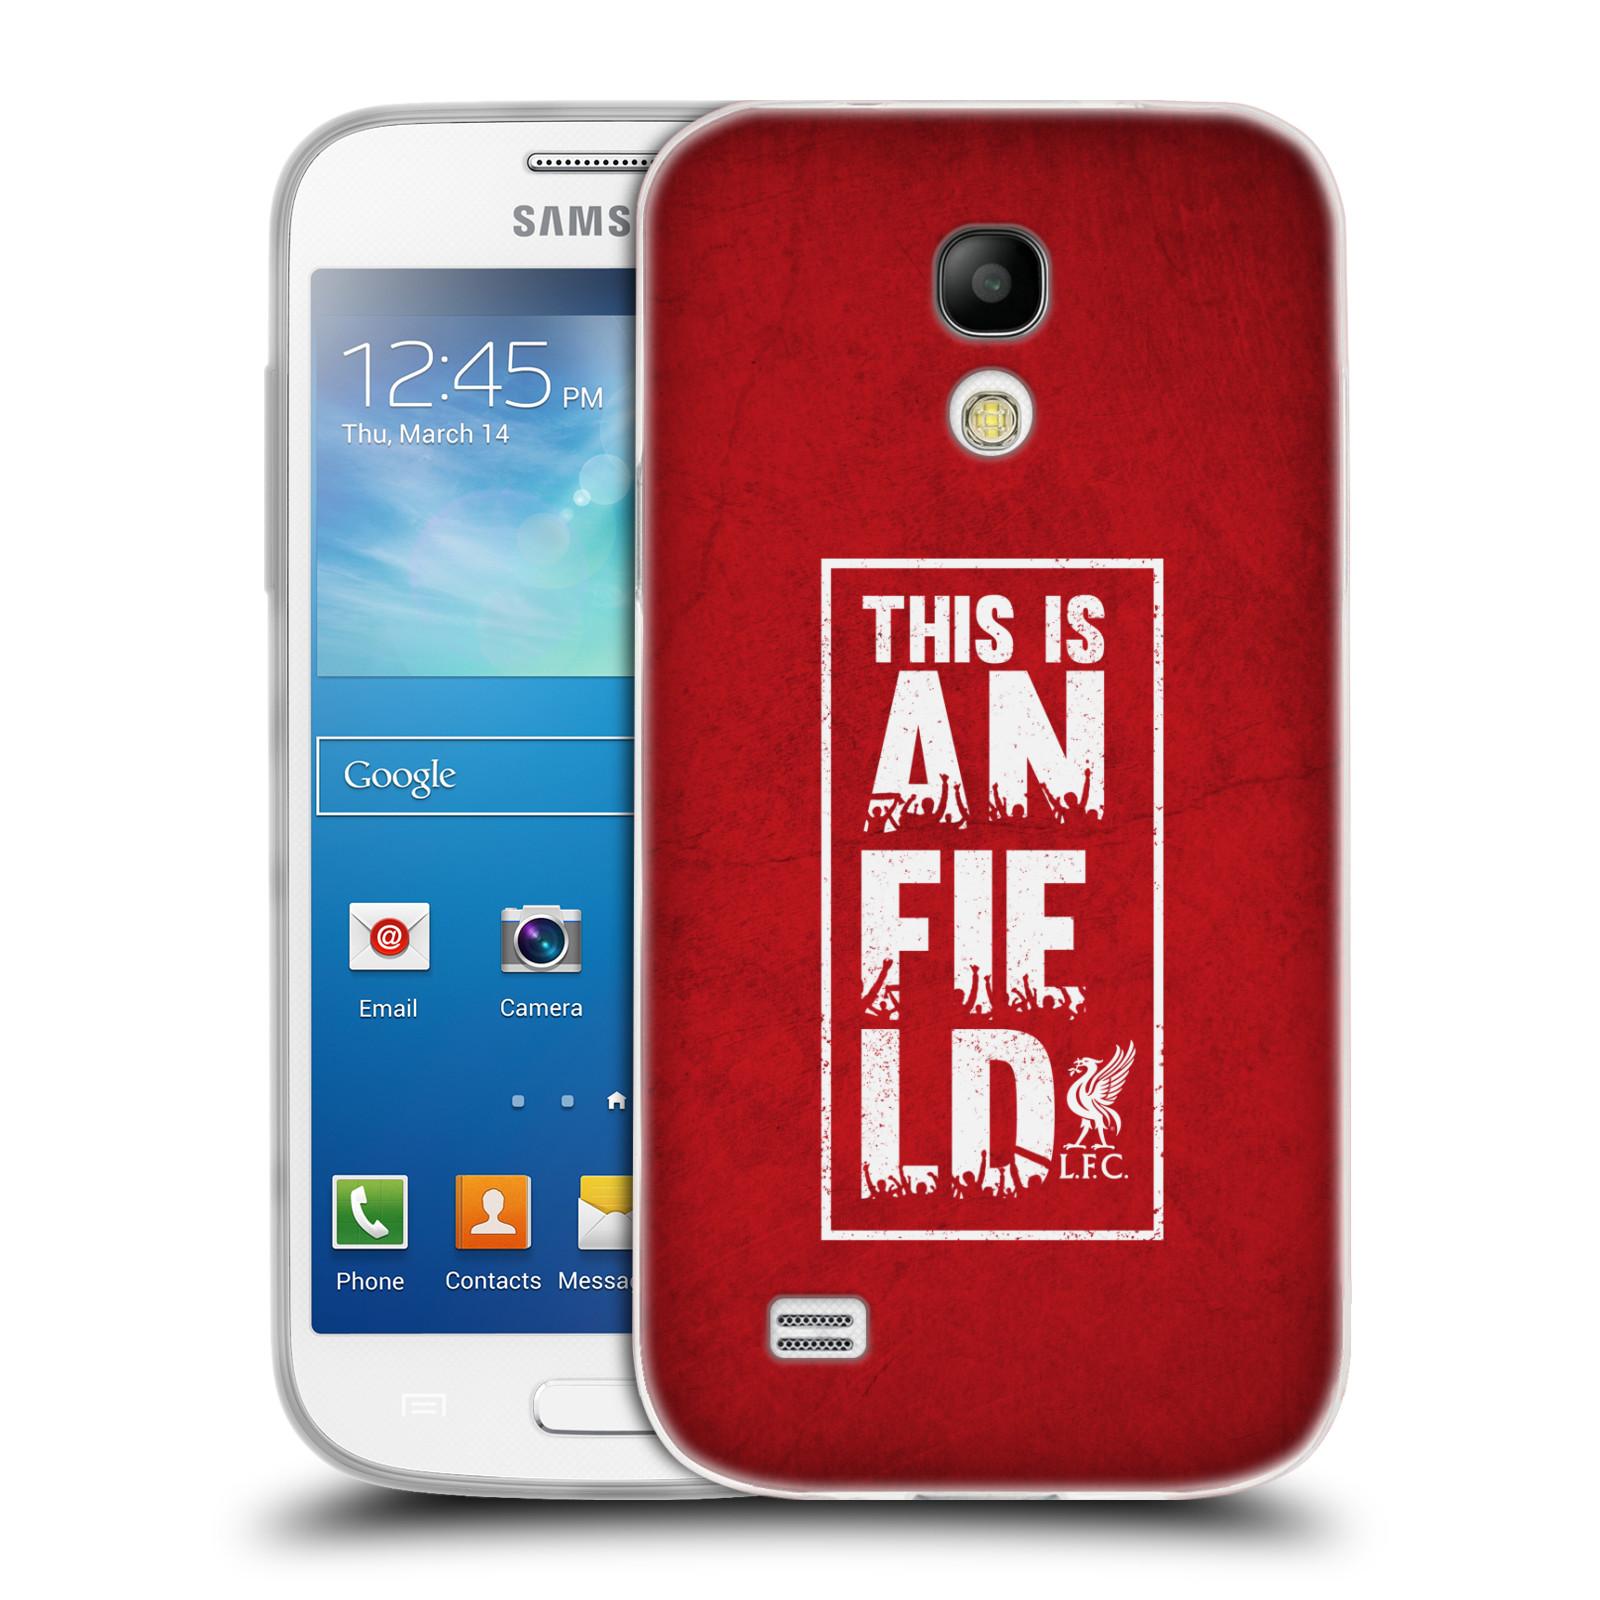 Silikonové pouzdro na mobil Samsung Galaxy S4 Mini HEAD CASE Liverpool FC This Is Anfield Red (Silikonový kryt či obal na mobilní telefon Liverpool FC Official pro Samsung Galaxy S4 Mini GT-i9195 / i9190)